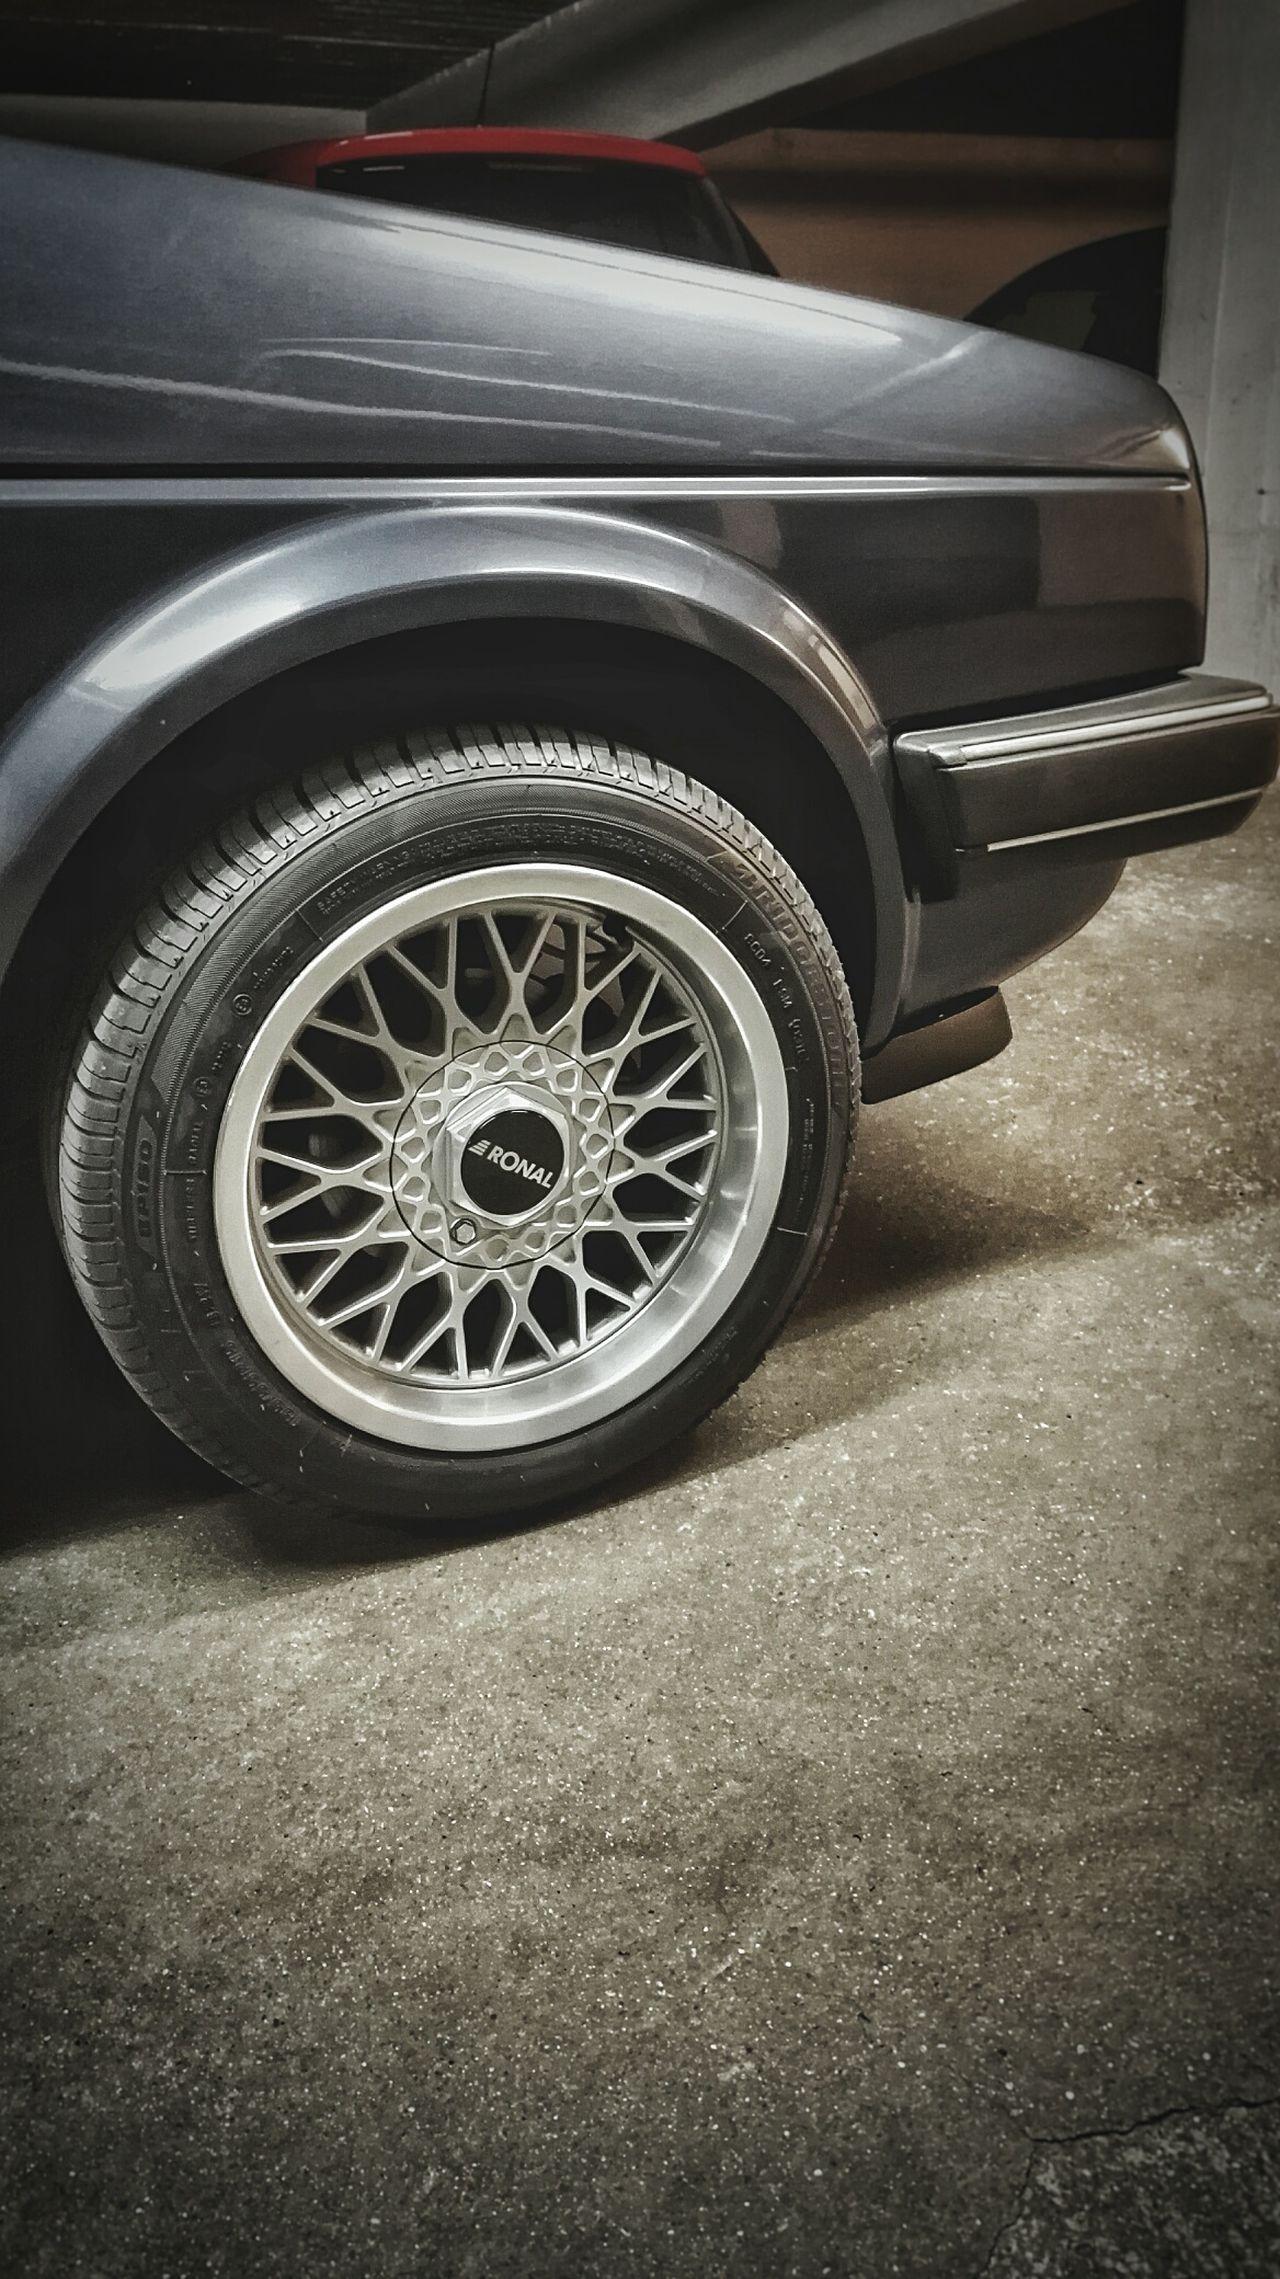 Ronal Wheels Golf Mk2 CL Coupé Youngtimer Import Vonoma Keinradio